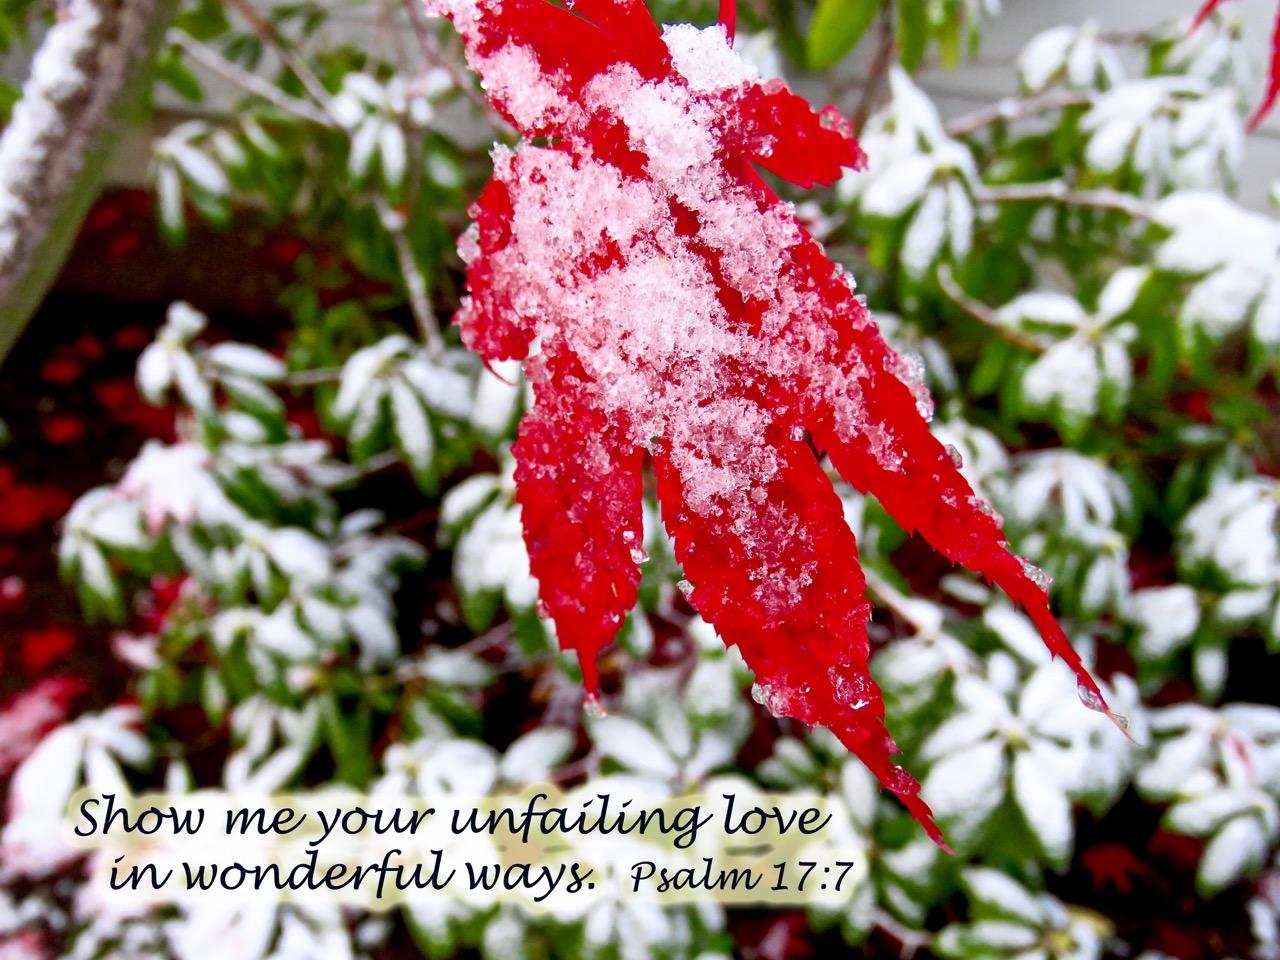 Psalm 17 7